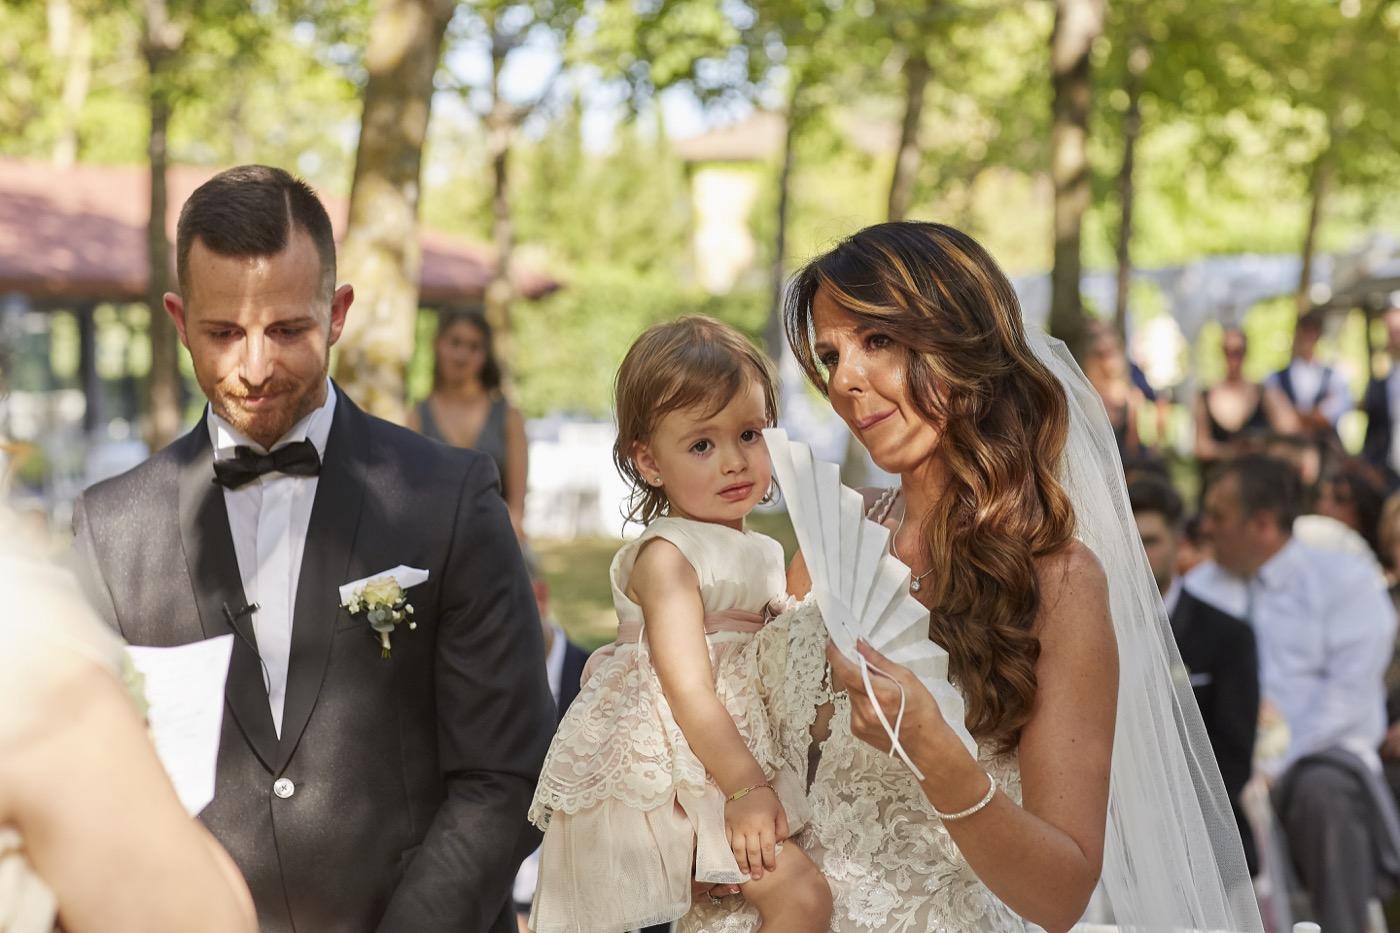 Claudio-Coppola-wedding-photographer-la-scuderia-eventi-preparativi-la-rosetta-perugia-52